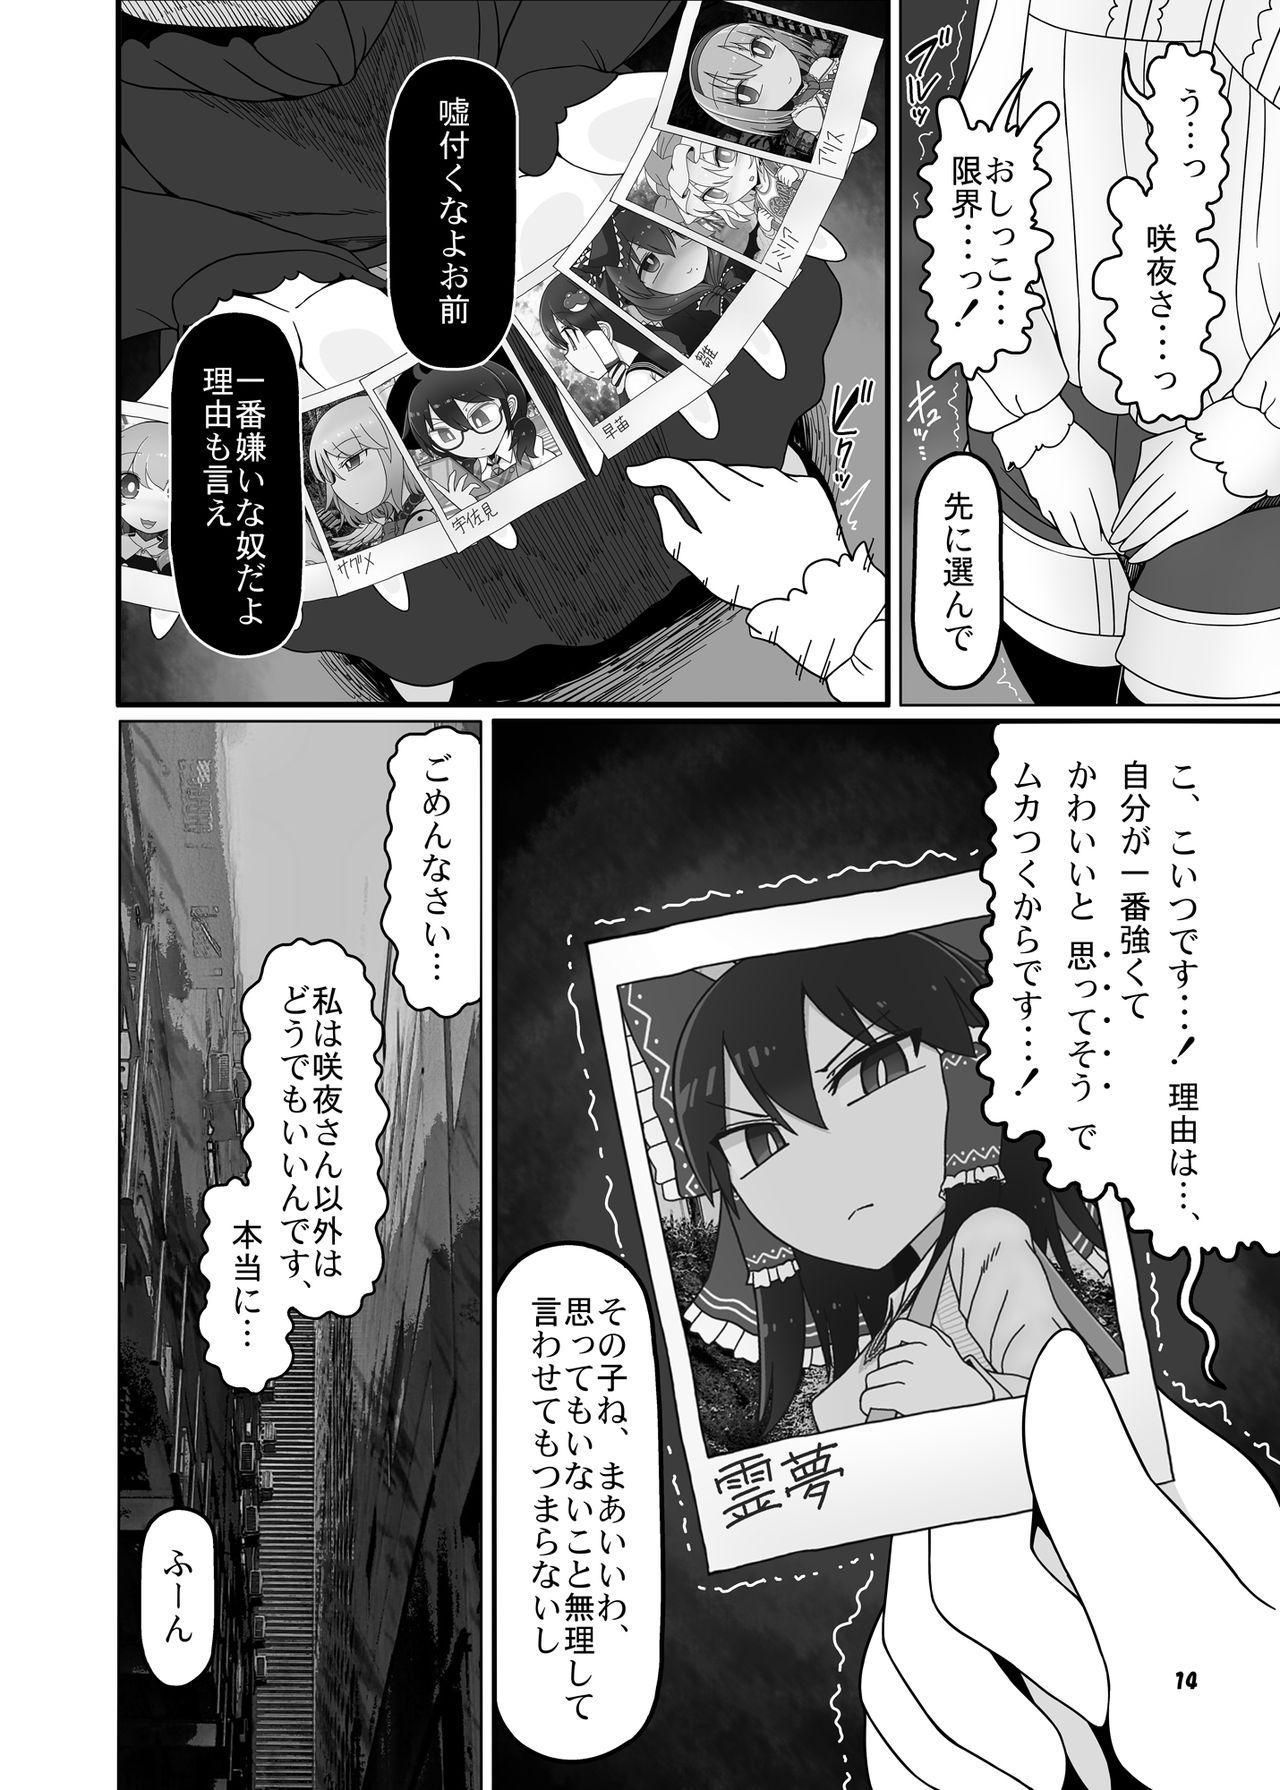 SakuMyon Kinki 2 Scatolo Makikomi Hen 12